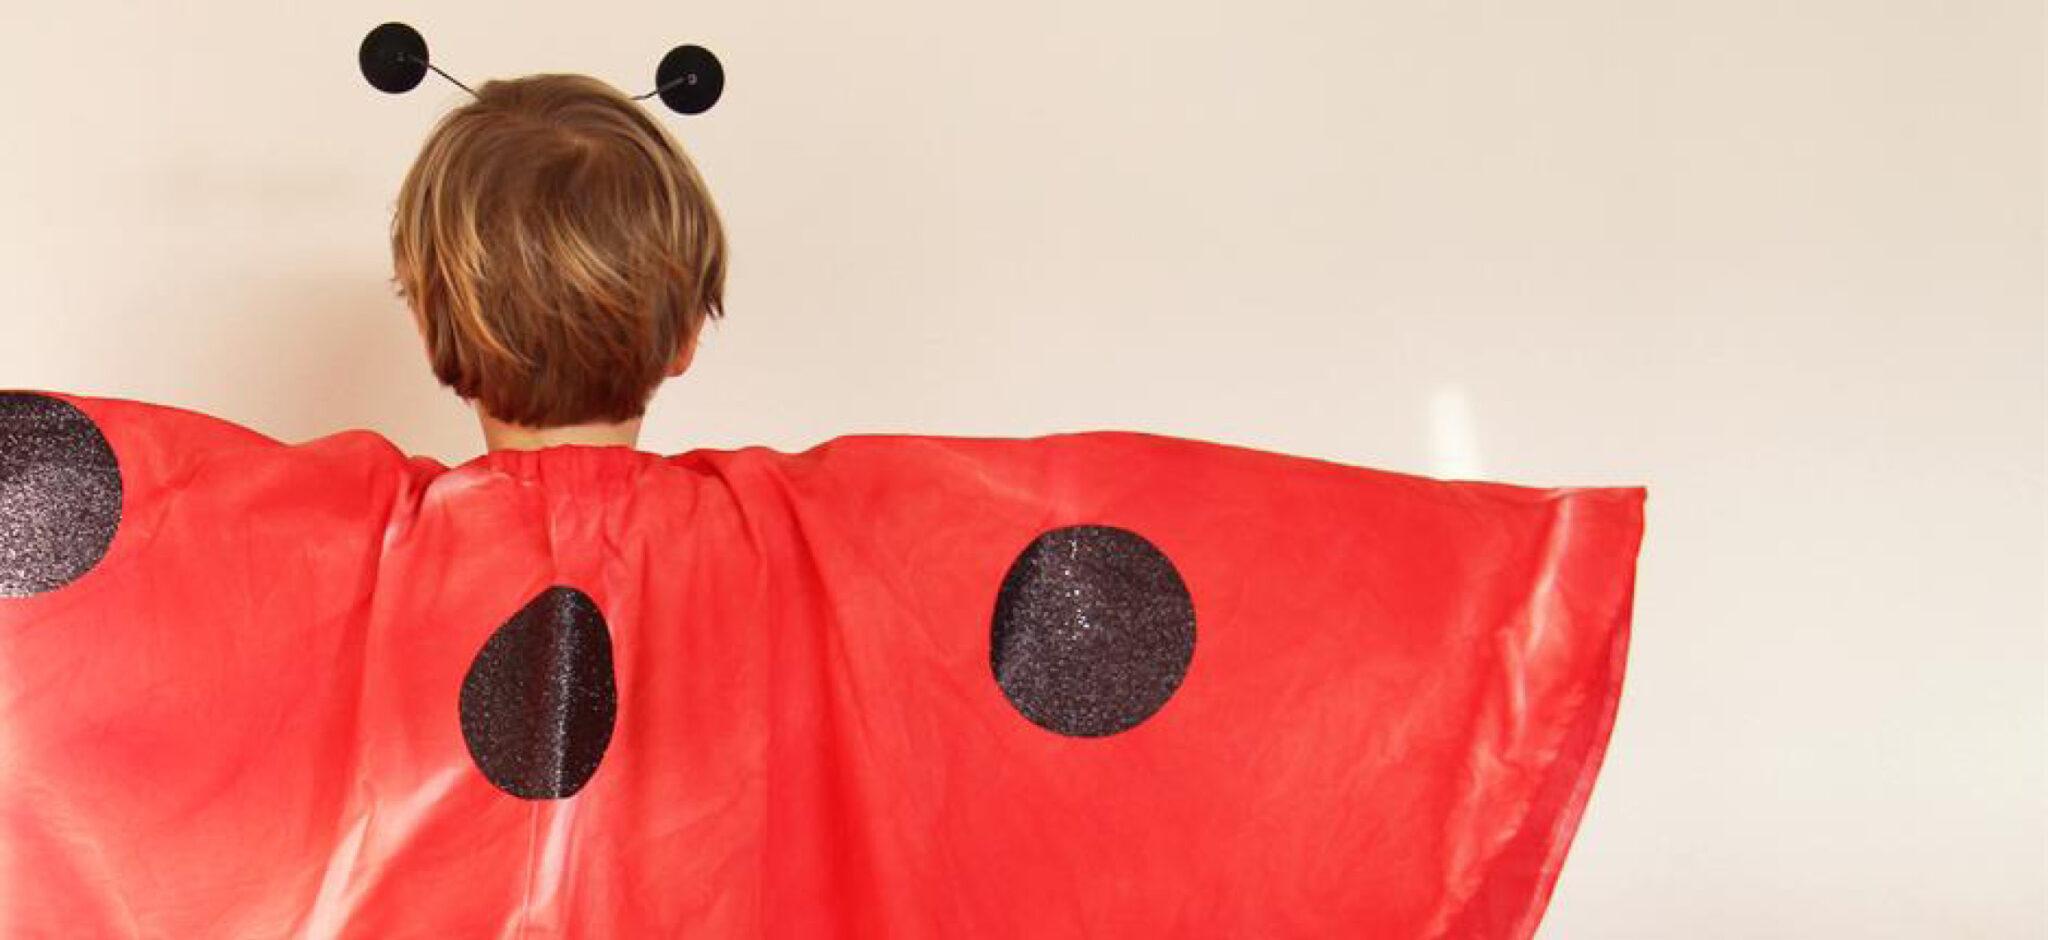 mariehøne kostume, kostume til fasteavn, fastlanvn kostume mariehøne, ladybug kostume, halloween kostume, kostume halloween, DIY kostume, hjemmelavet kostume, sådan laver du et fastelavnskostume, sådan laver du et halloween kostume